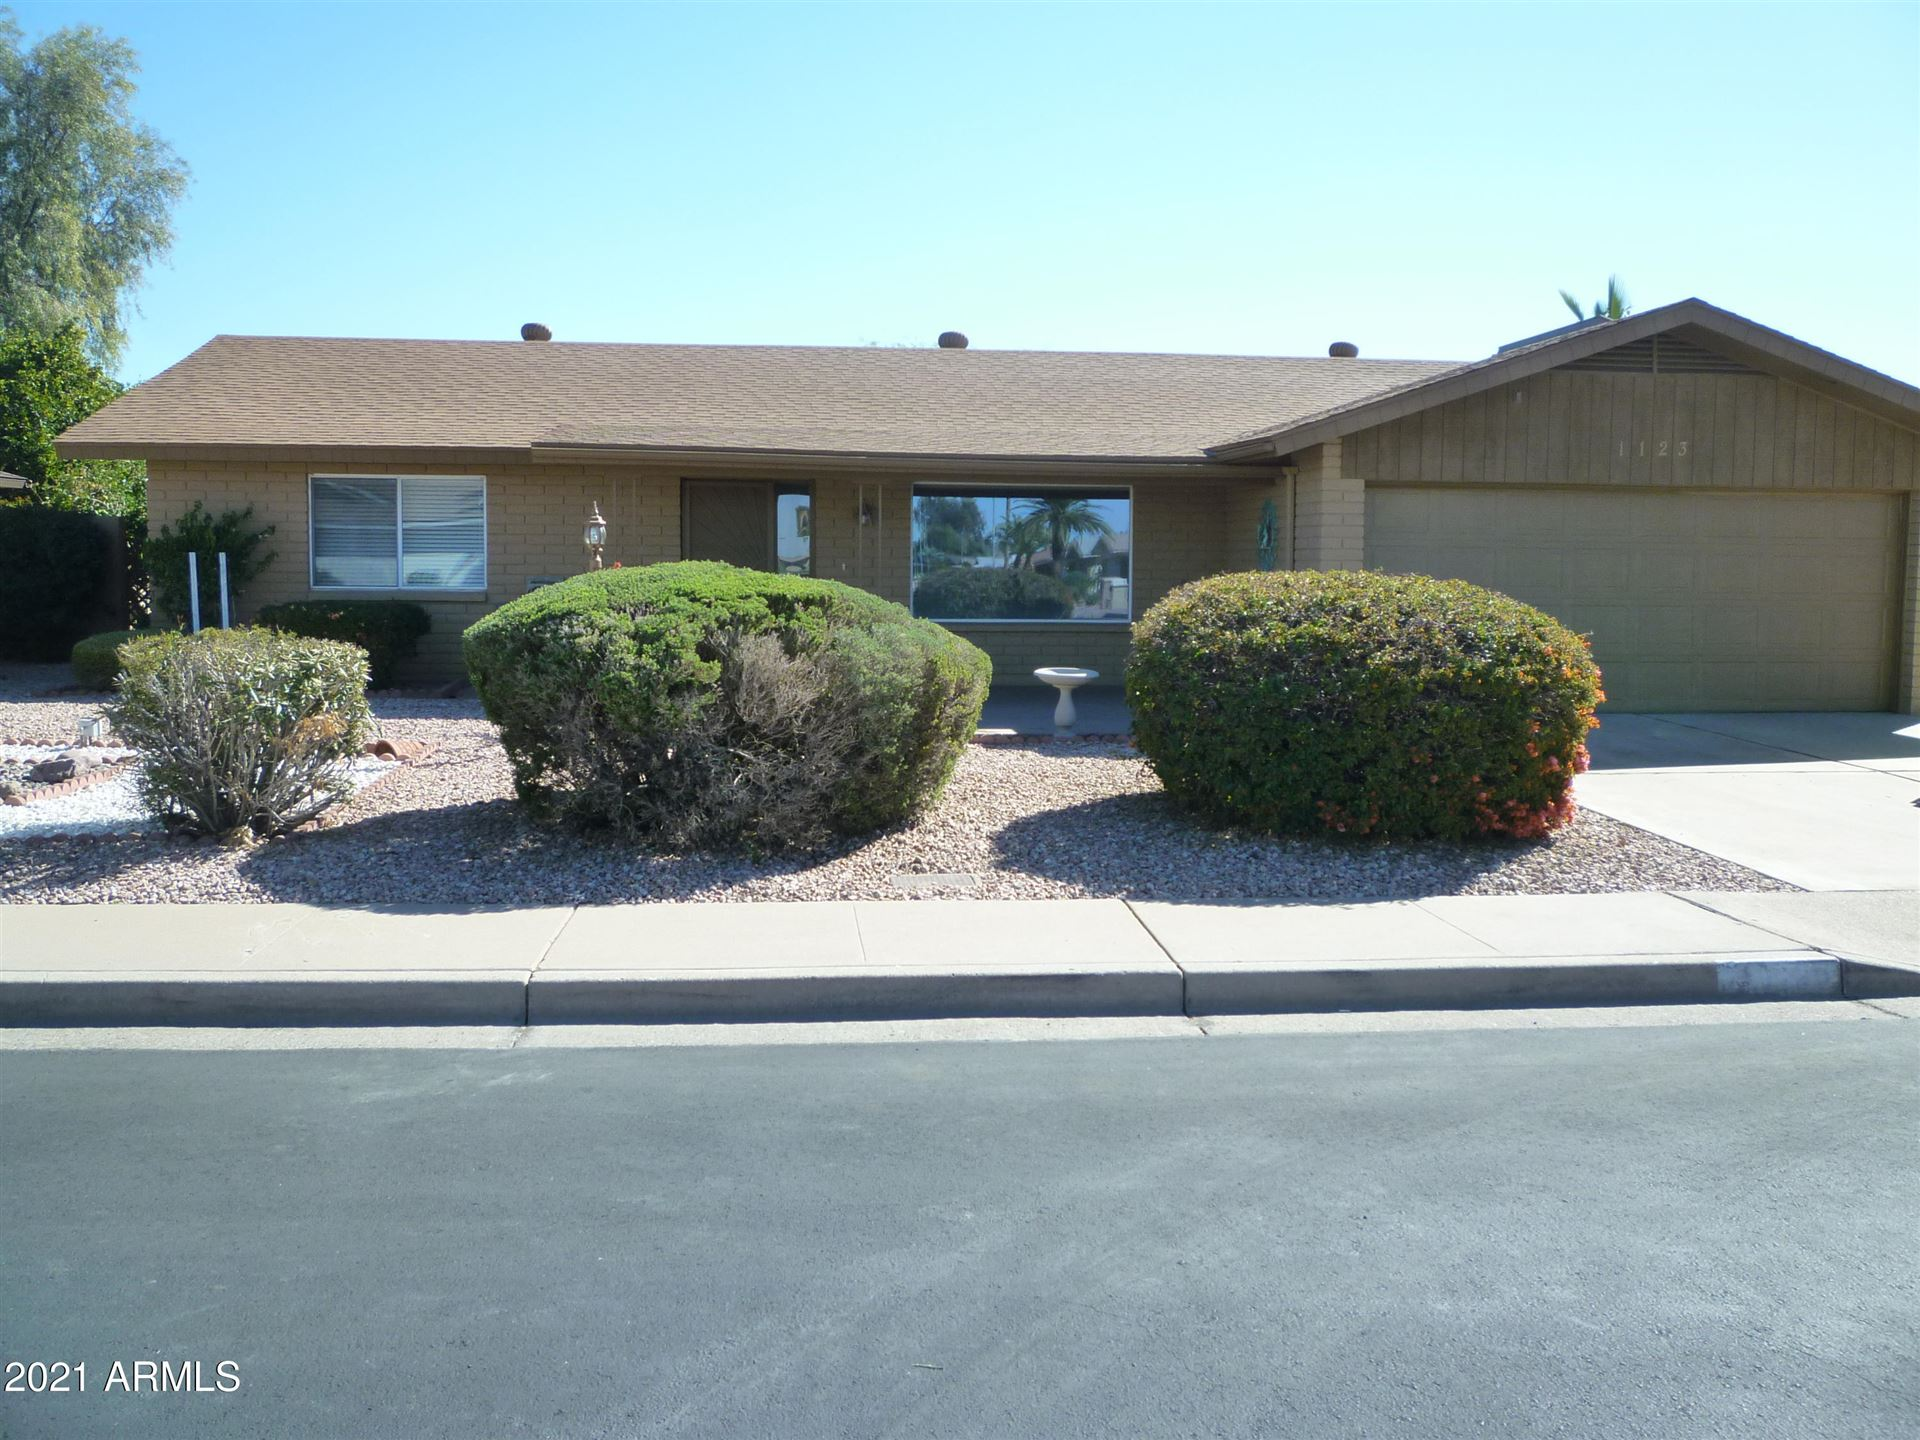 Photo of 1123 S ST PAUL --, Mesa, AZ 85206 (MLS # 6200772)